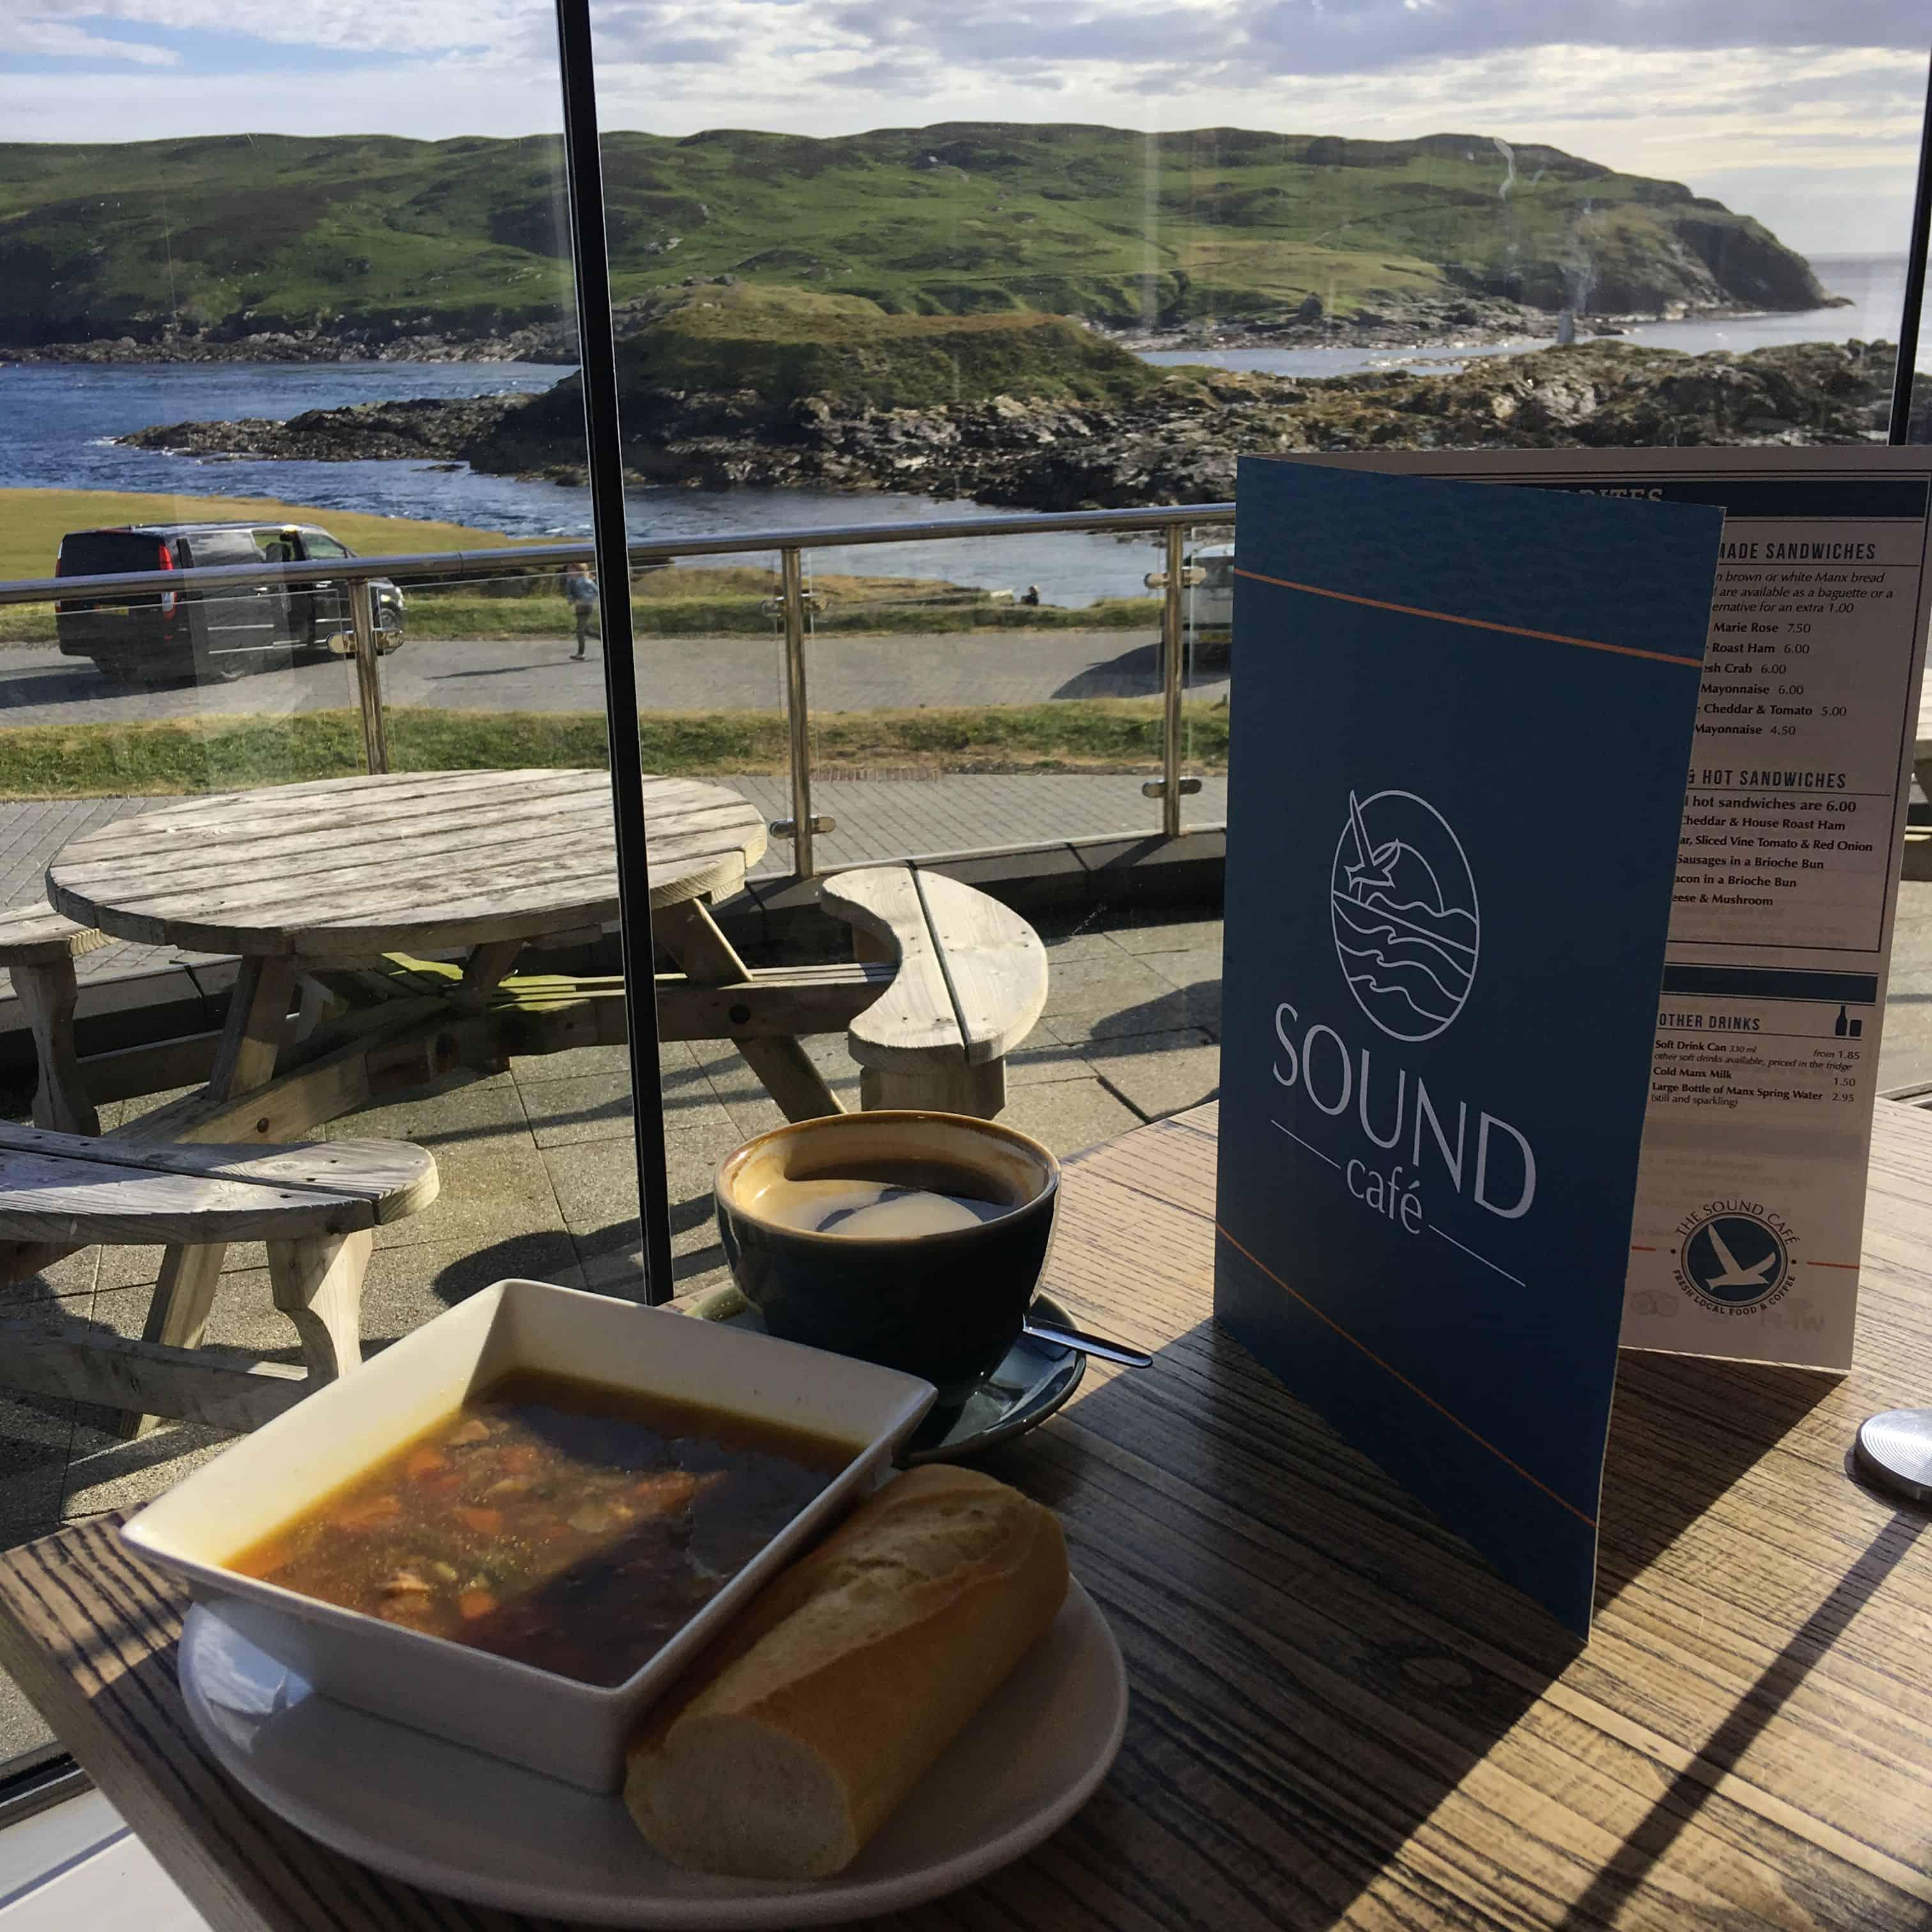 Sound Cafe ok to use Instagram 2018 - Manx National Heritage